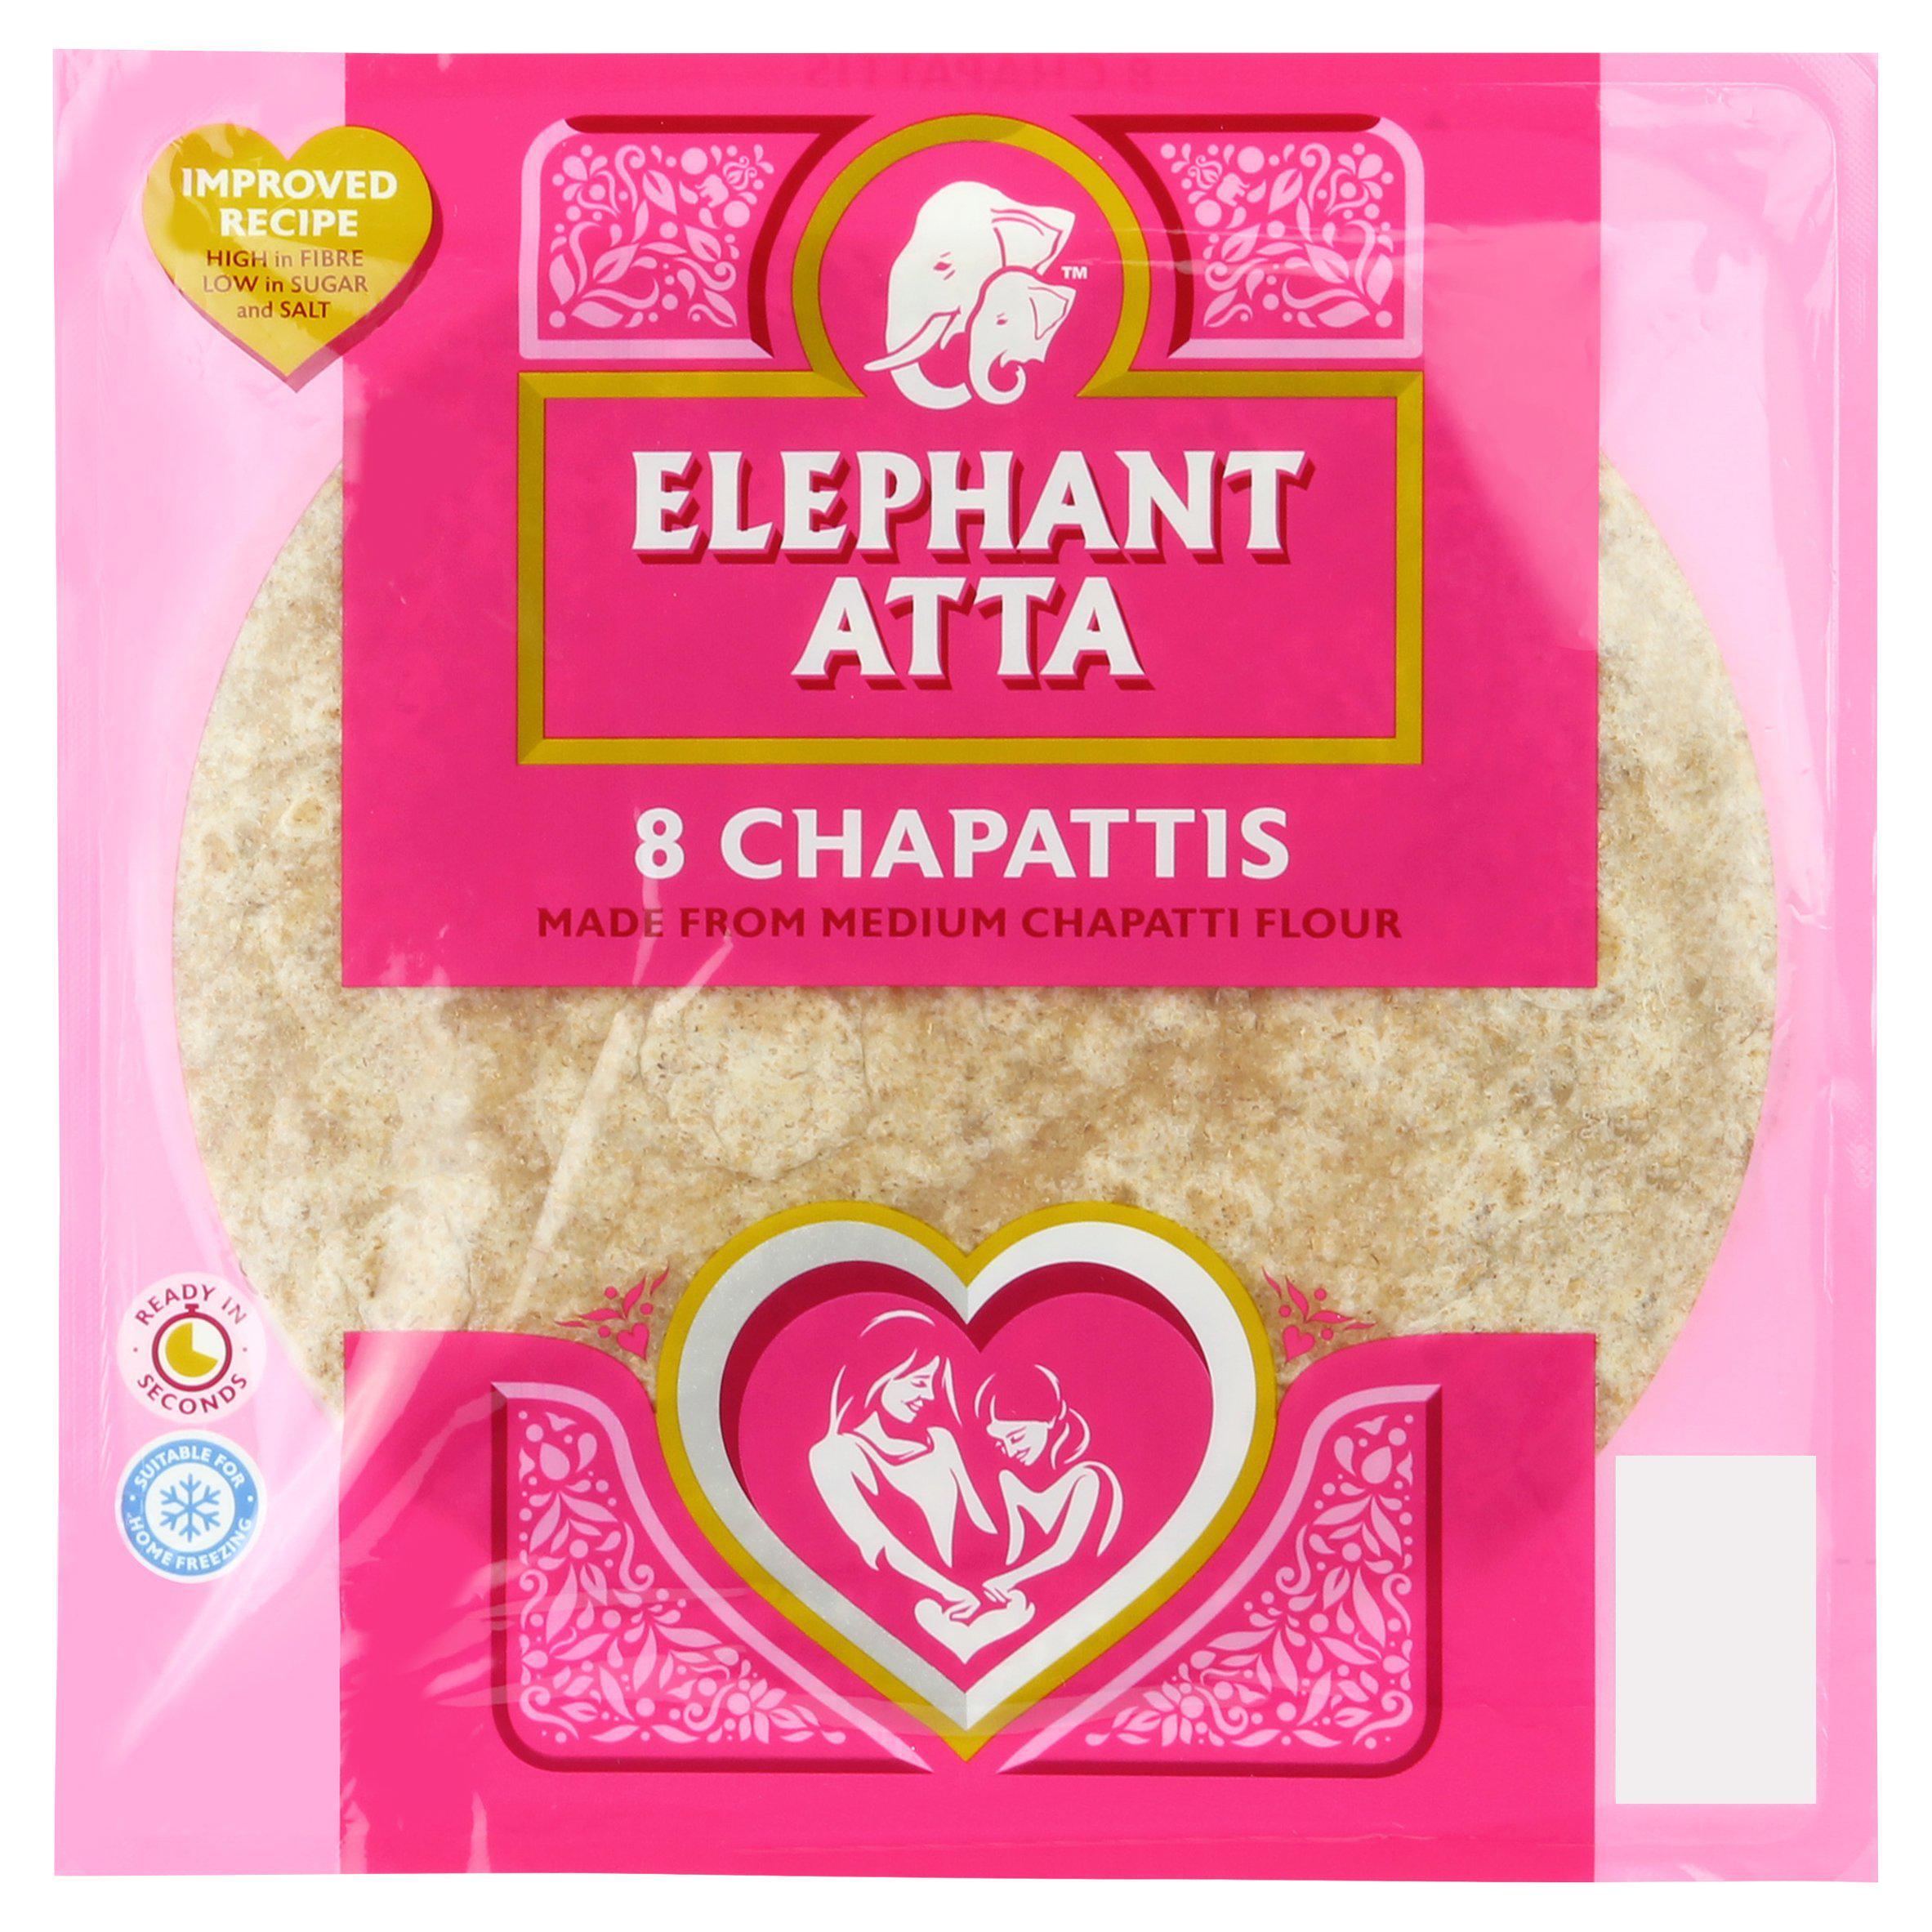 Elephant Atta Chapattis 360g £1 @ Sainsbury's